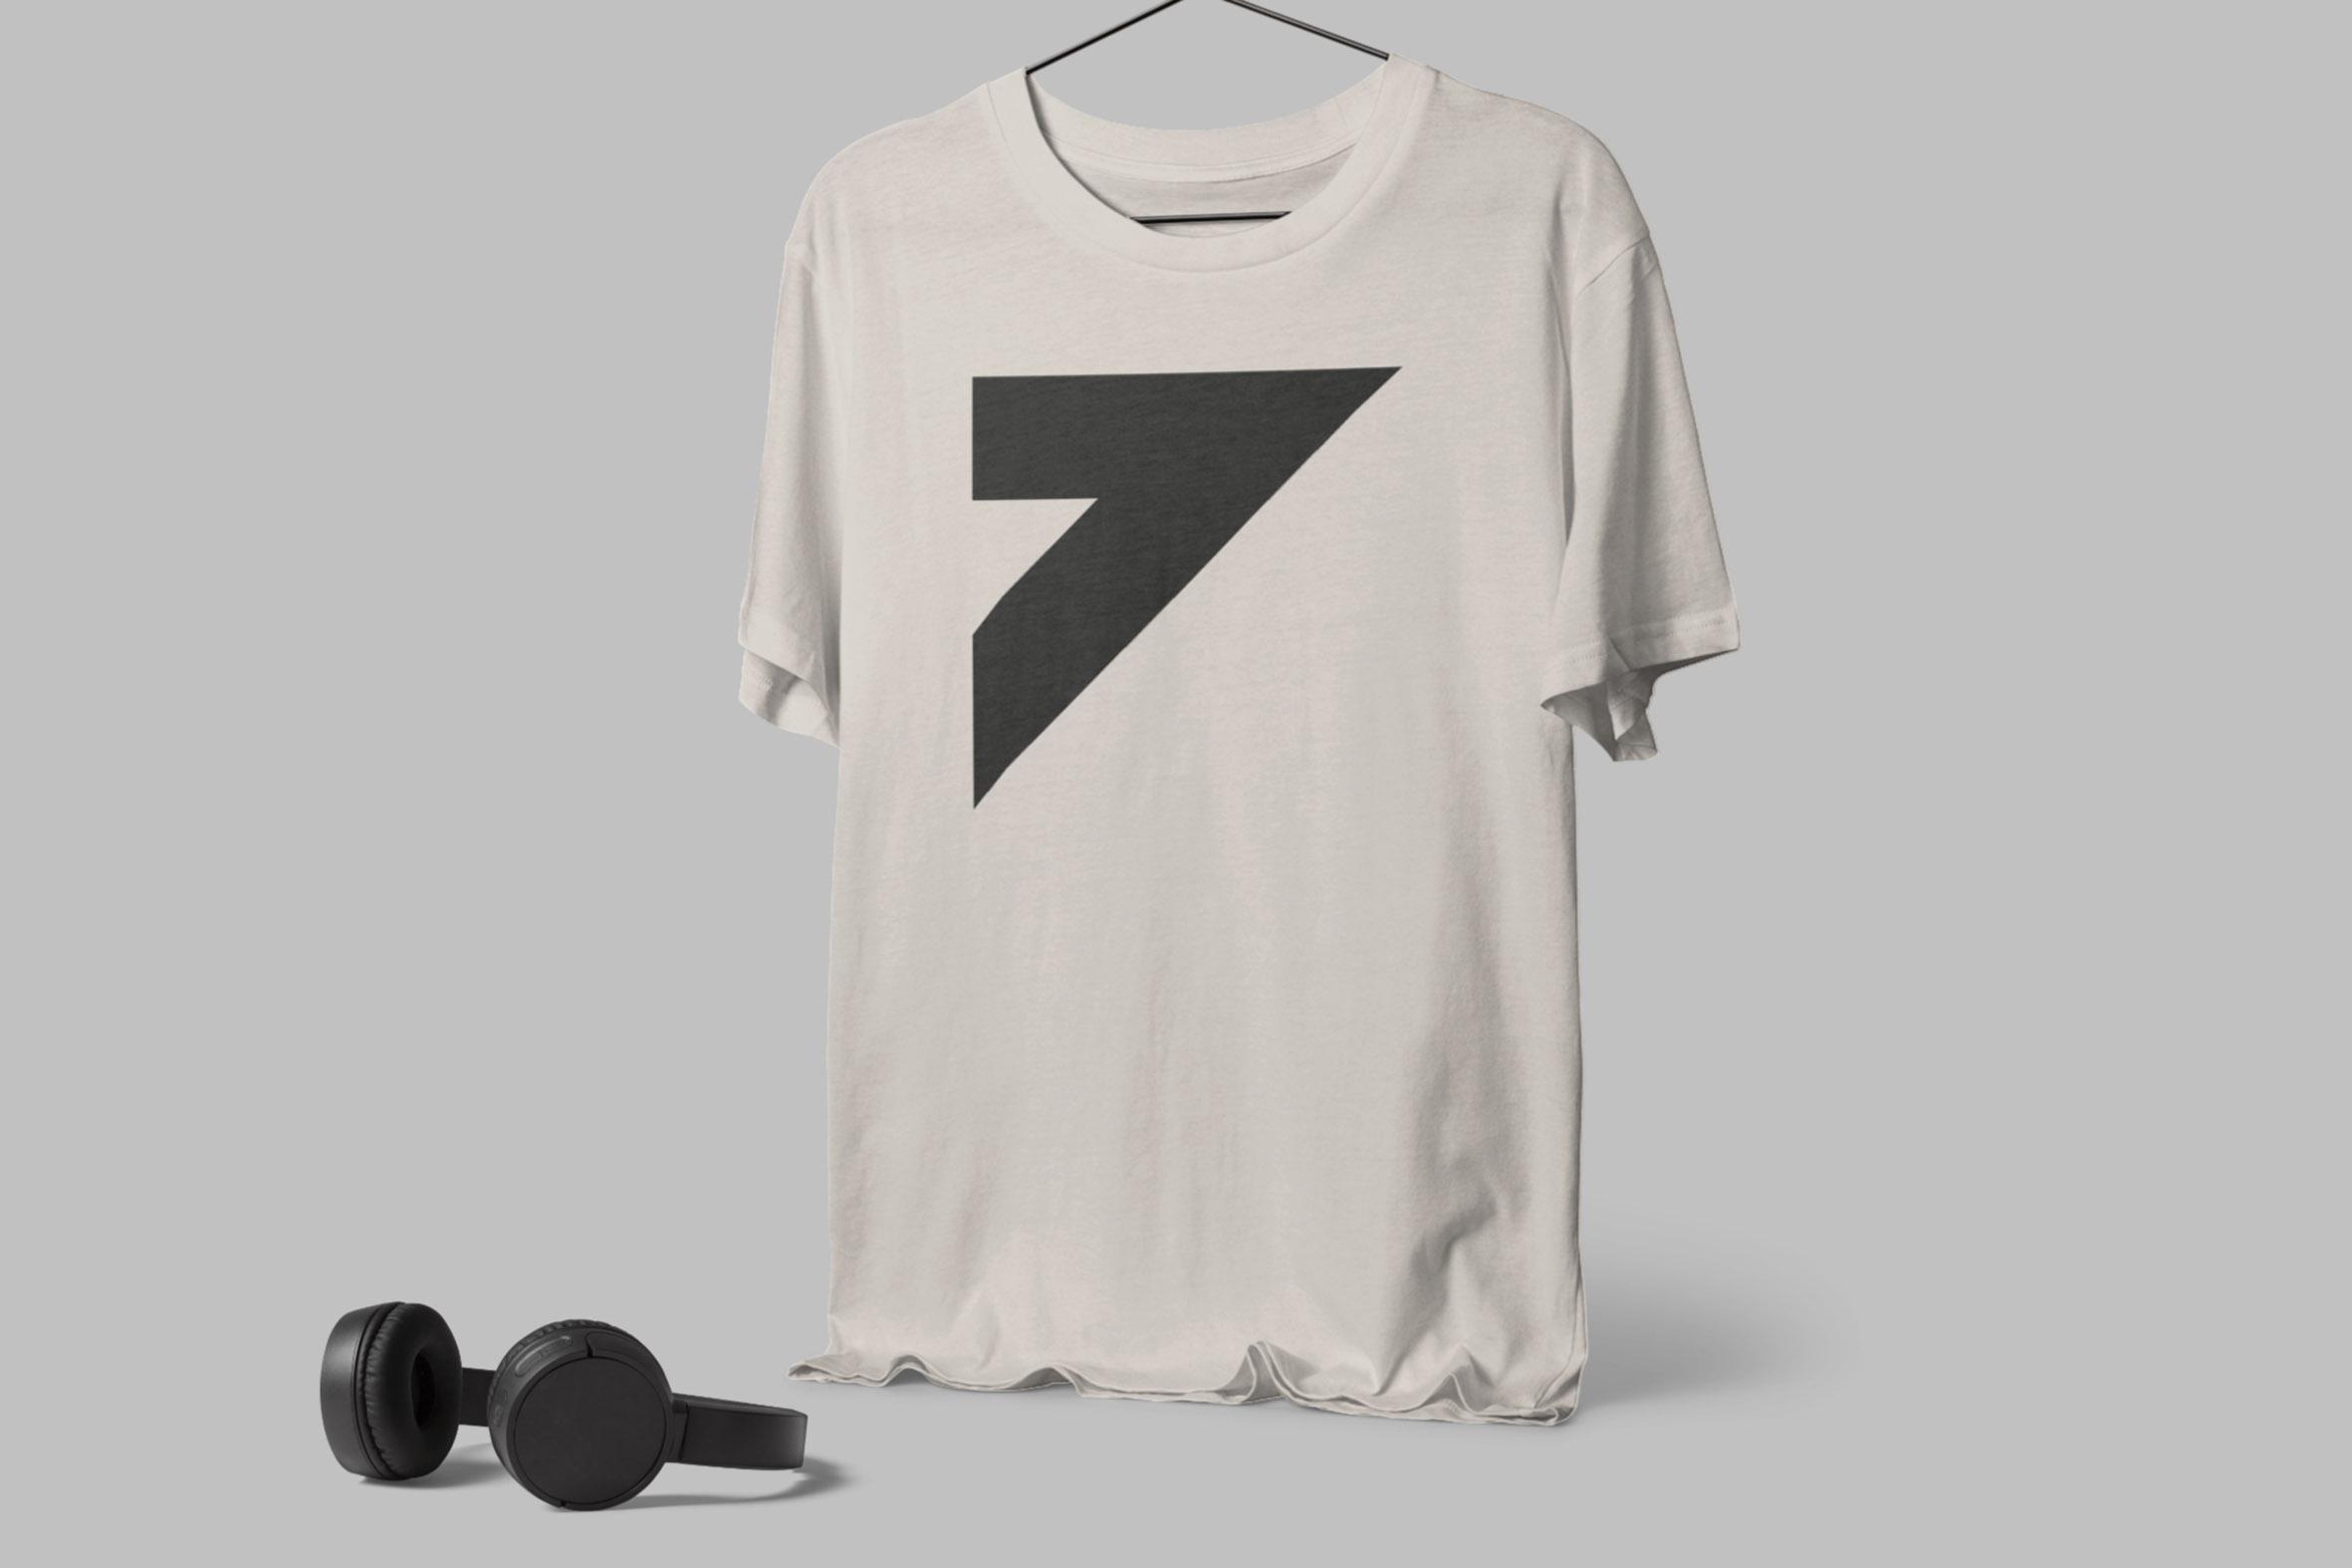 klave-tshirt-Daniel-Cavalcanti